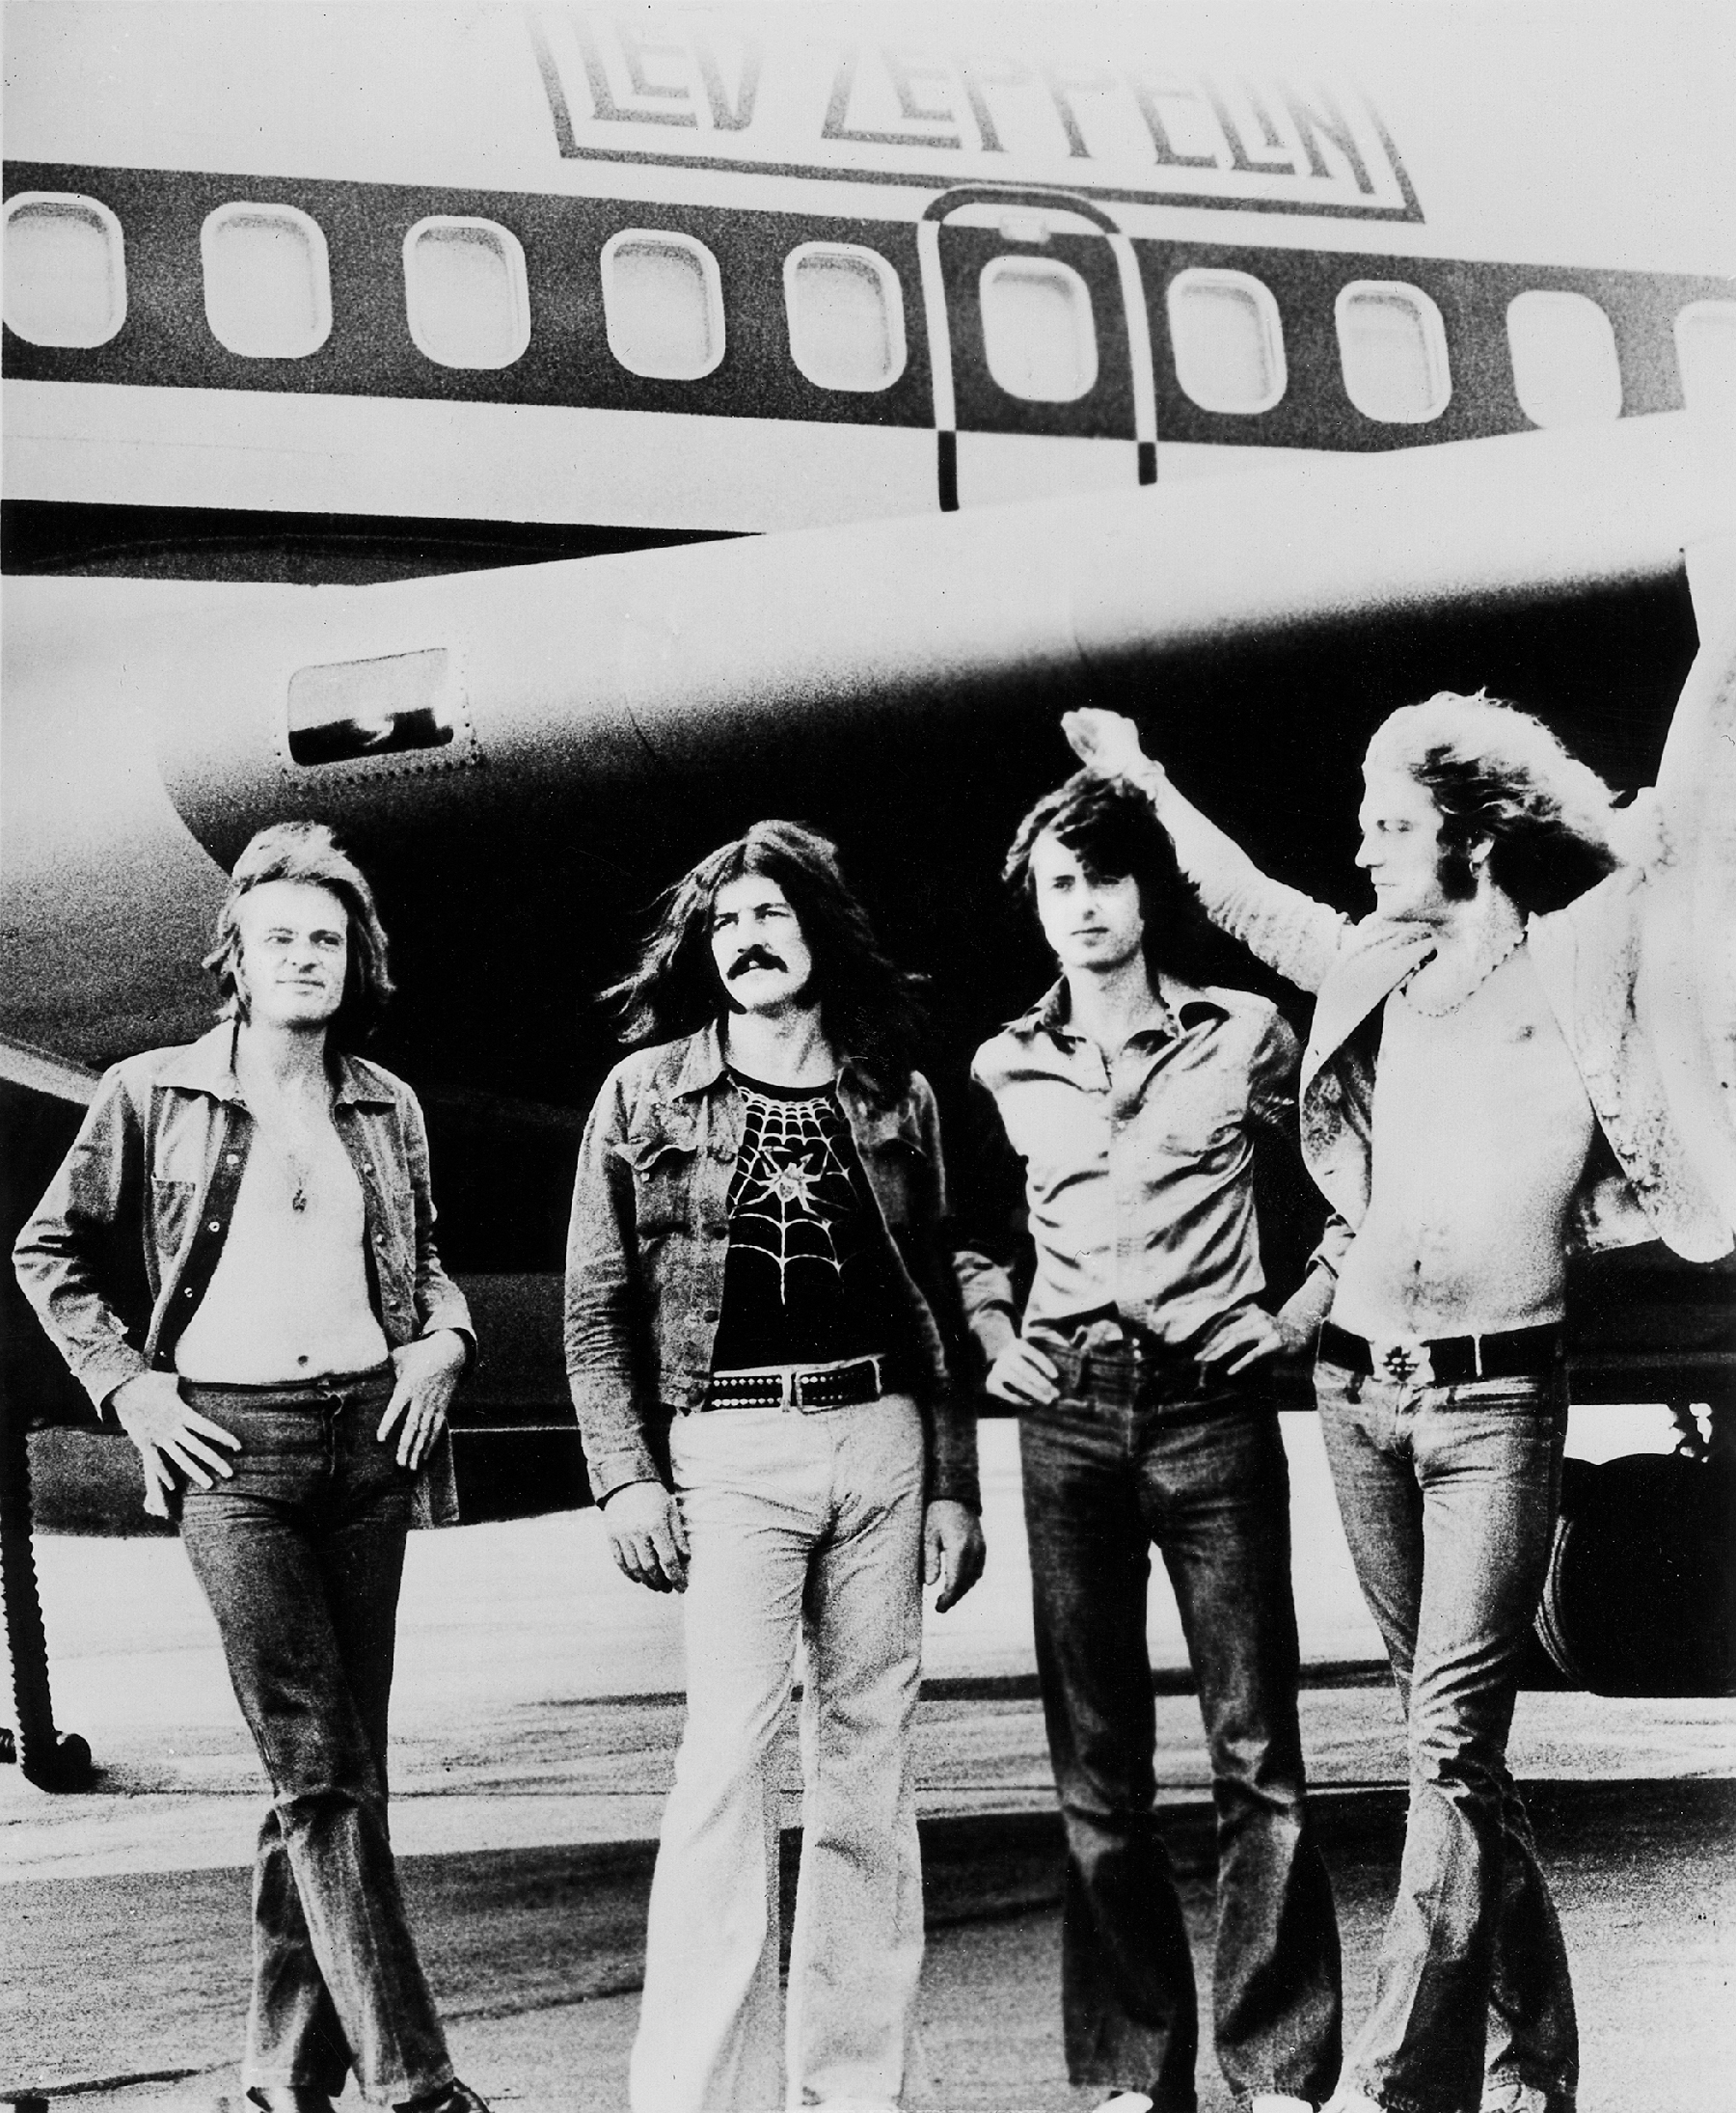 Let Zeppelin